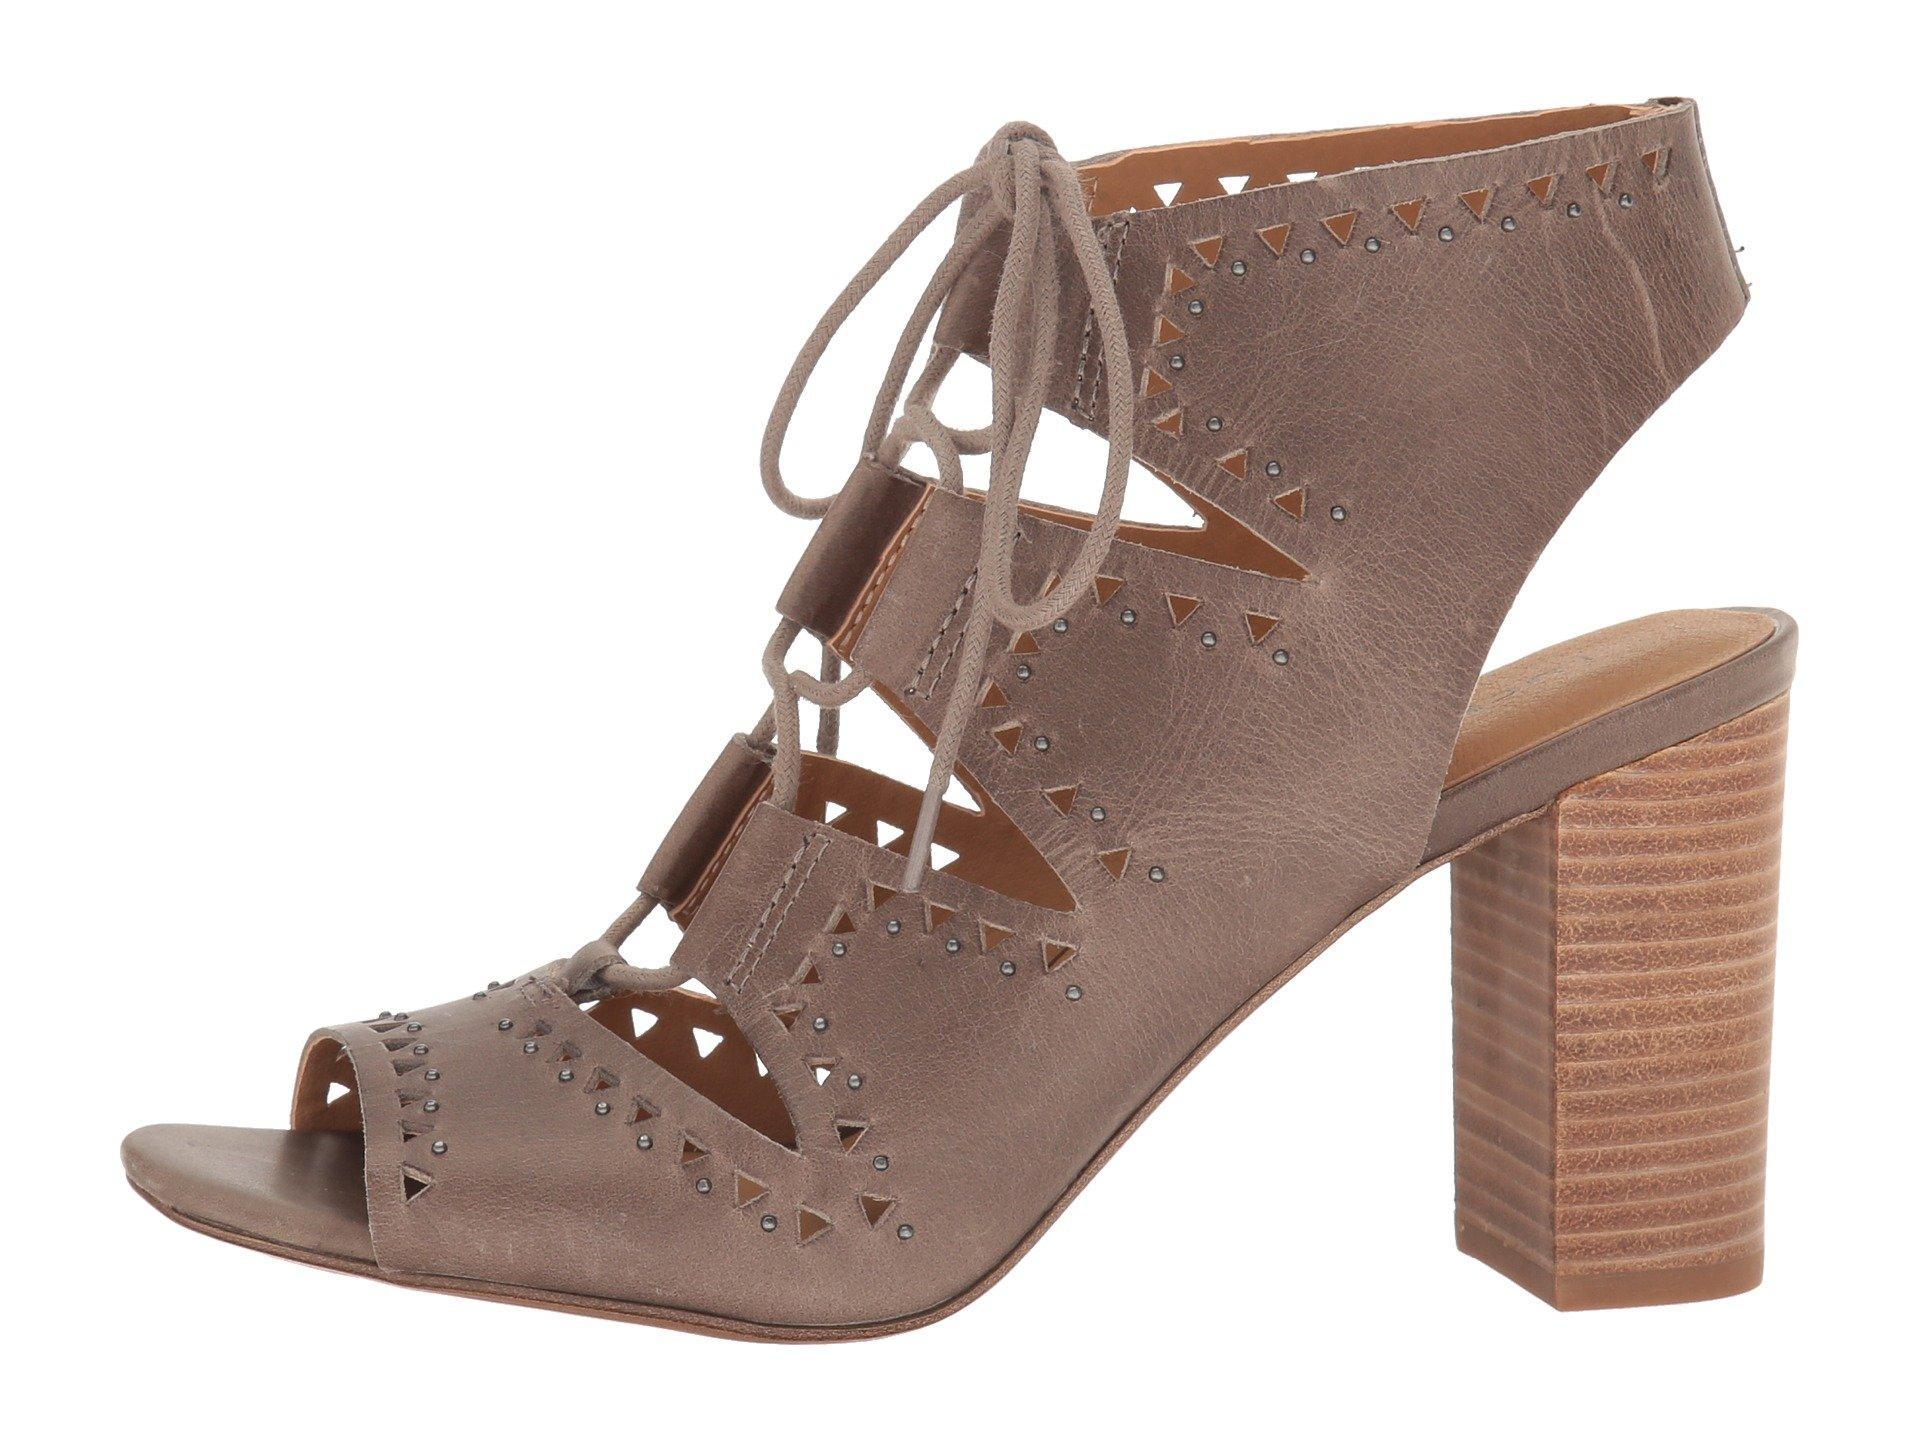 Tafia Lucky Brand Women's About Details Wedge Sandal OkiPZXuT